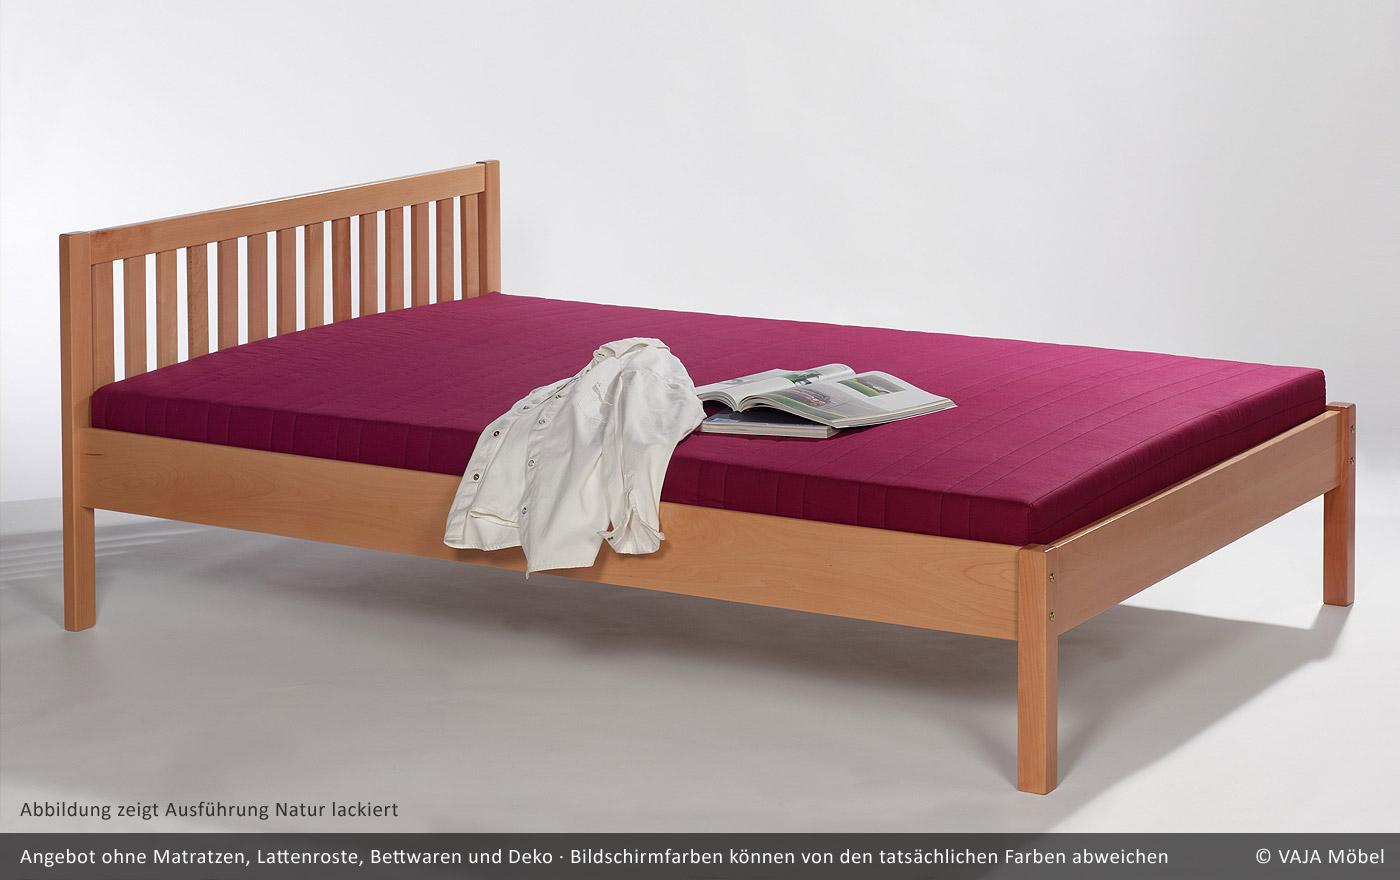 futonbetten betten betten m bel startseite betten prinz gmbh. Black Bedroom Furniture Sets. Home Design Ideas